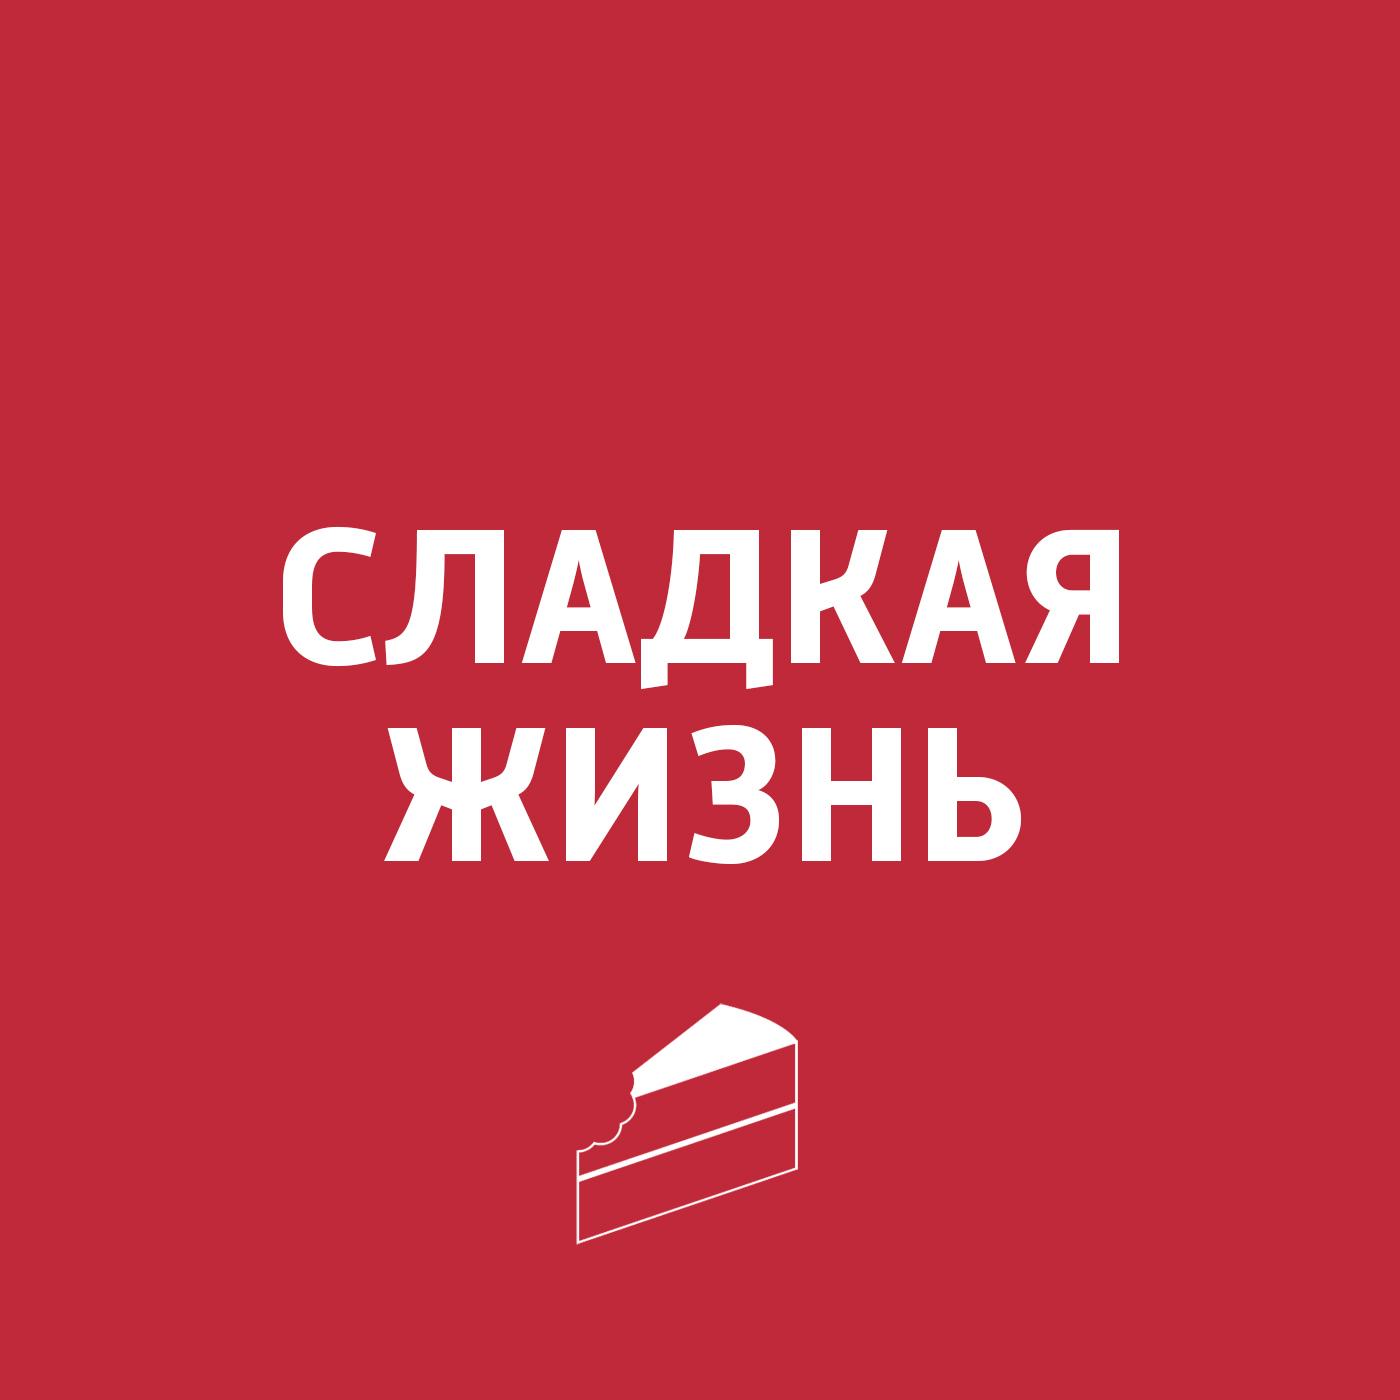 Картаев Павел Ириски картаев павел хворост